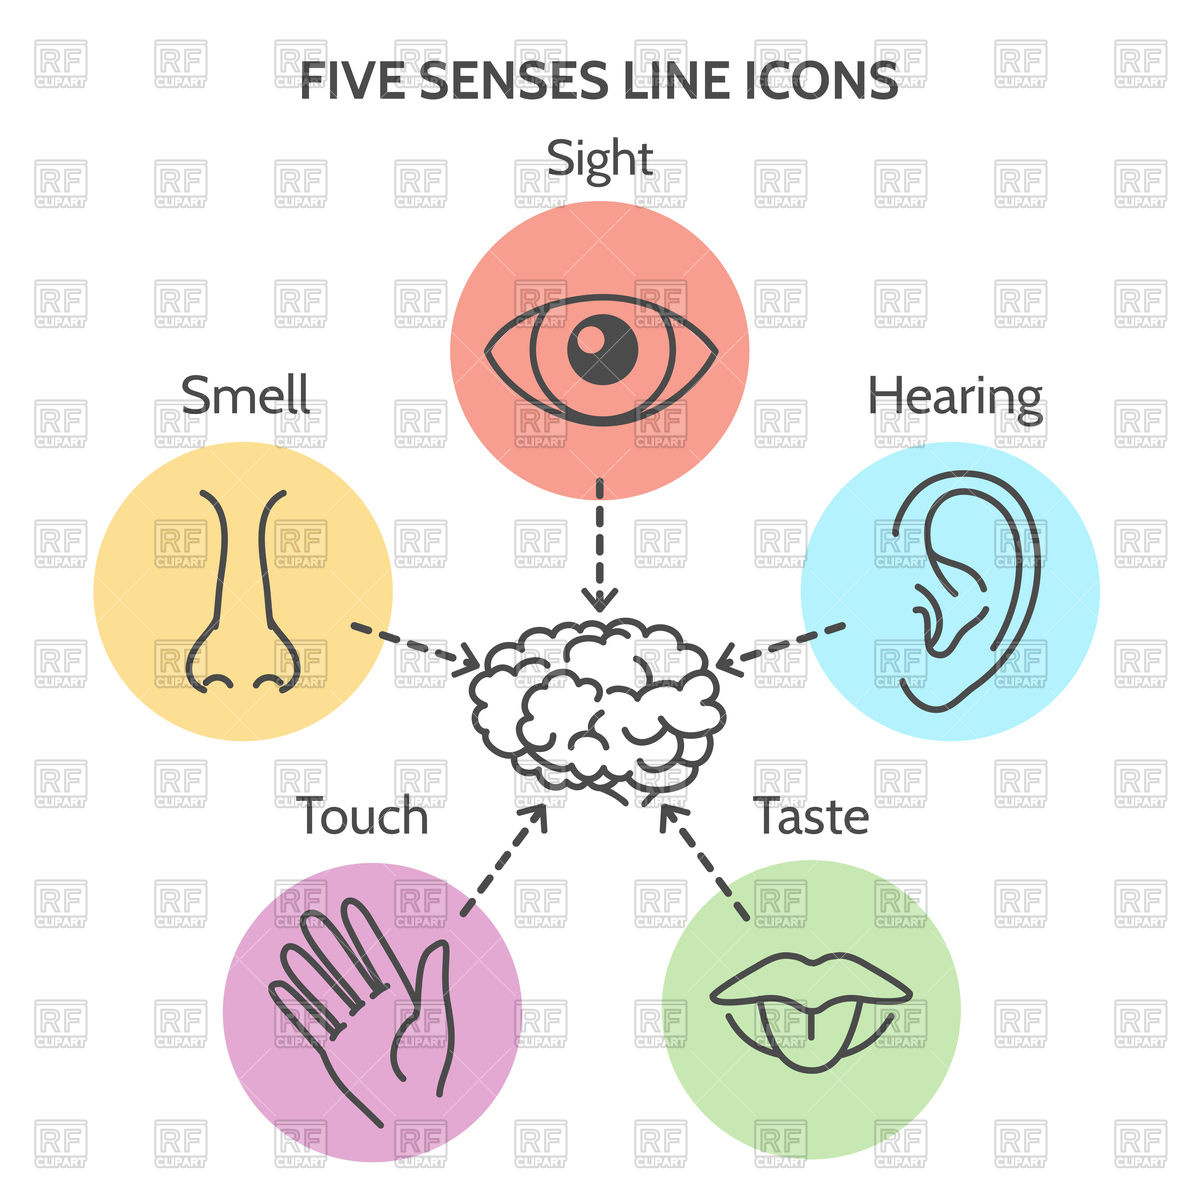 Five senses icon.